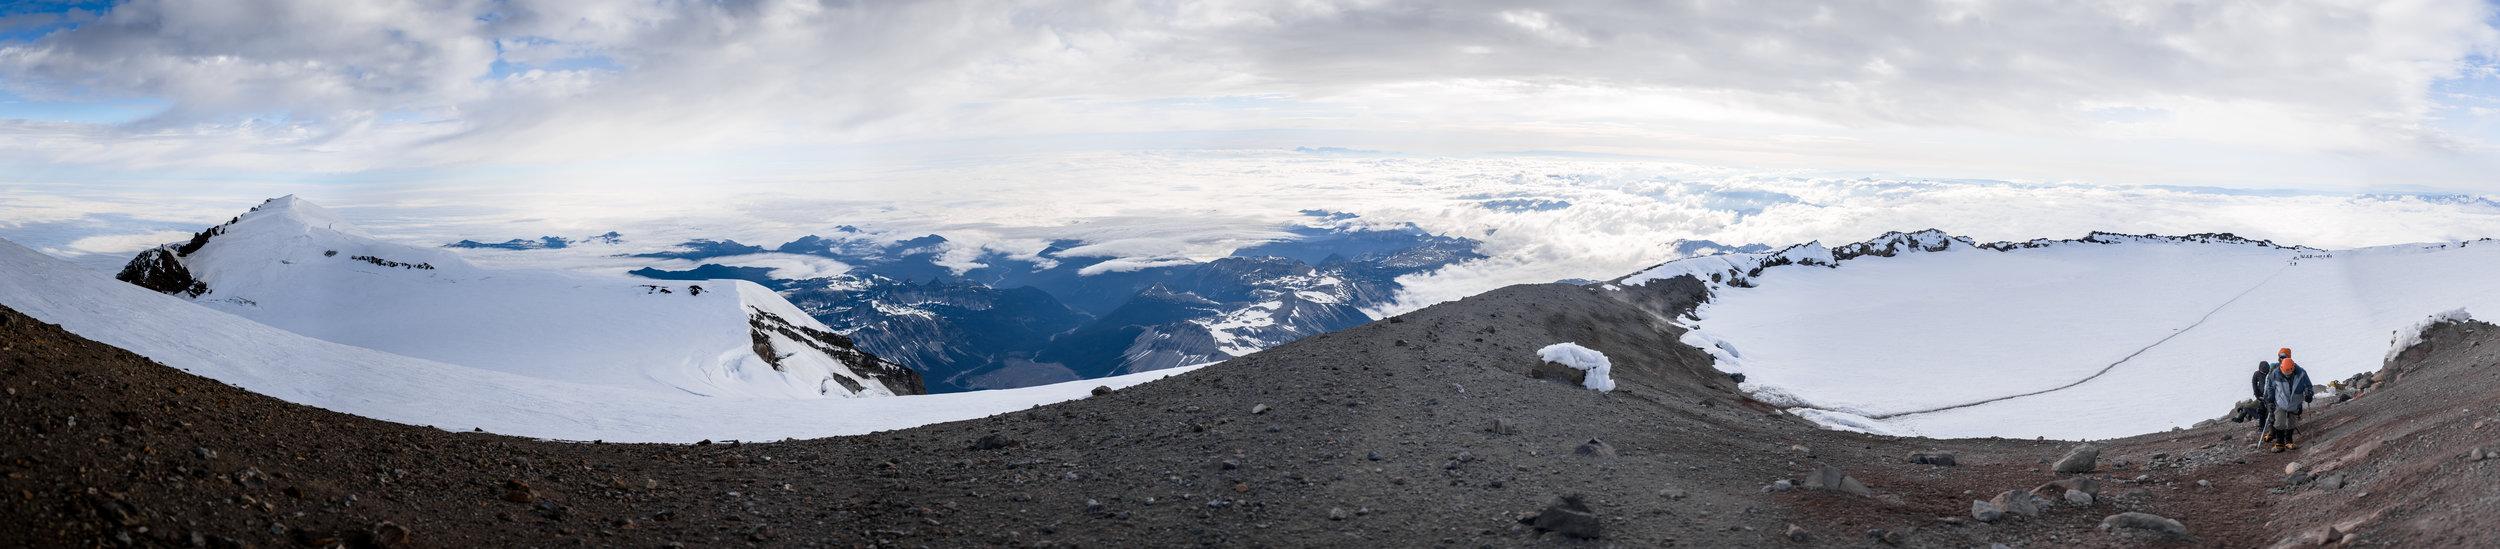 June 21, 2018 - Andrew Tat - Mount Rainier National Park - Mountaineering, Outdoors - 25.JPG